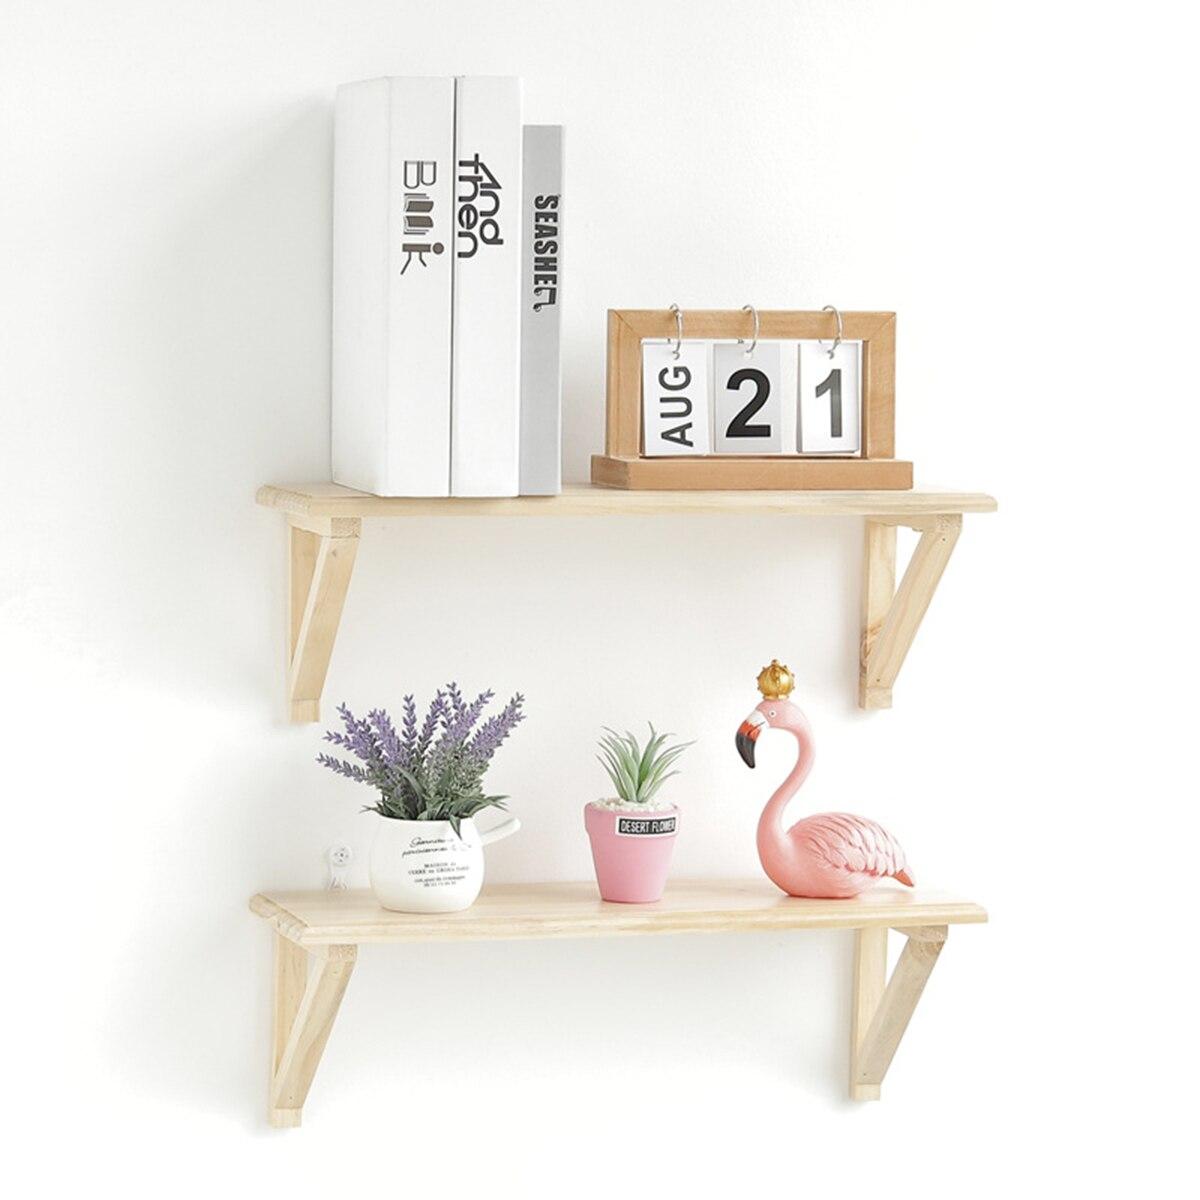 Bathroom Fixtures 1 Pc Wall Shelf Creative Decorative Solid Wood Sundries Organizer Bookshelf Storage Rack For Storage Flower Pot Sunglasses Books